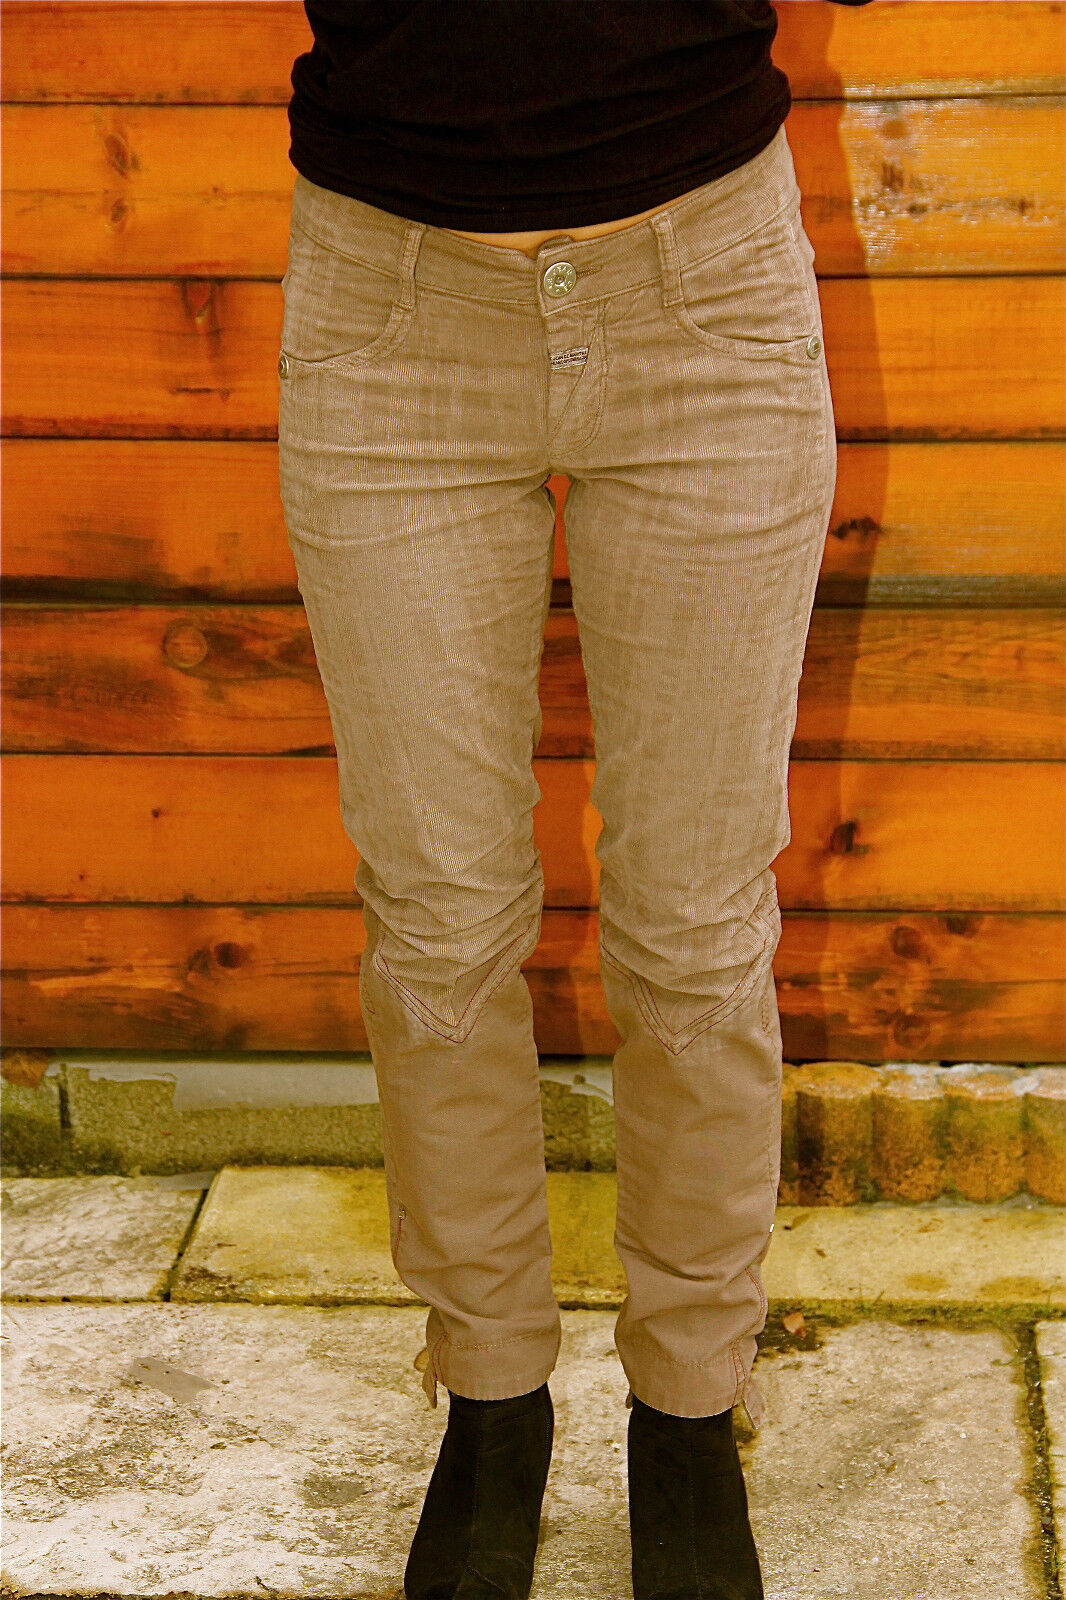 Pantalon velours camel M&F GIRBAUD tiagageddon T 31 (40-42)  NEUF ÉTIQUETTE